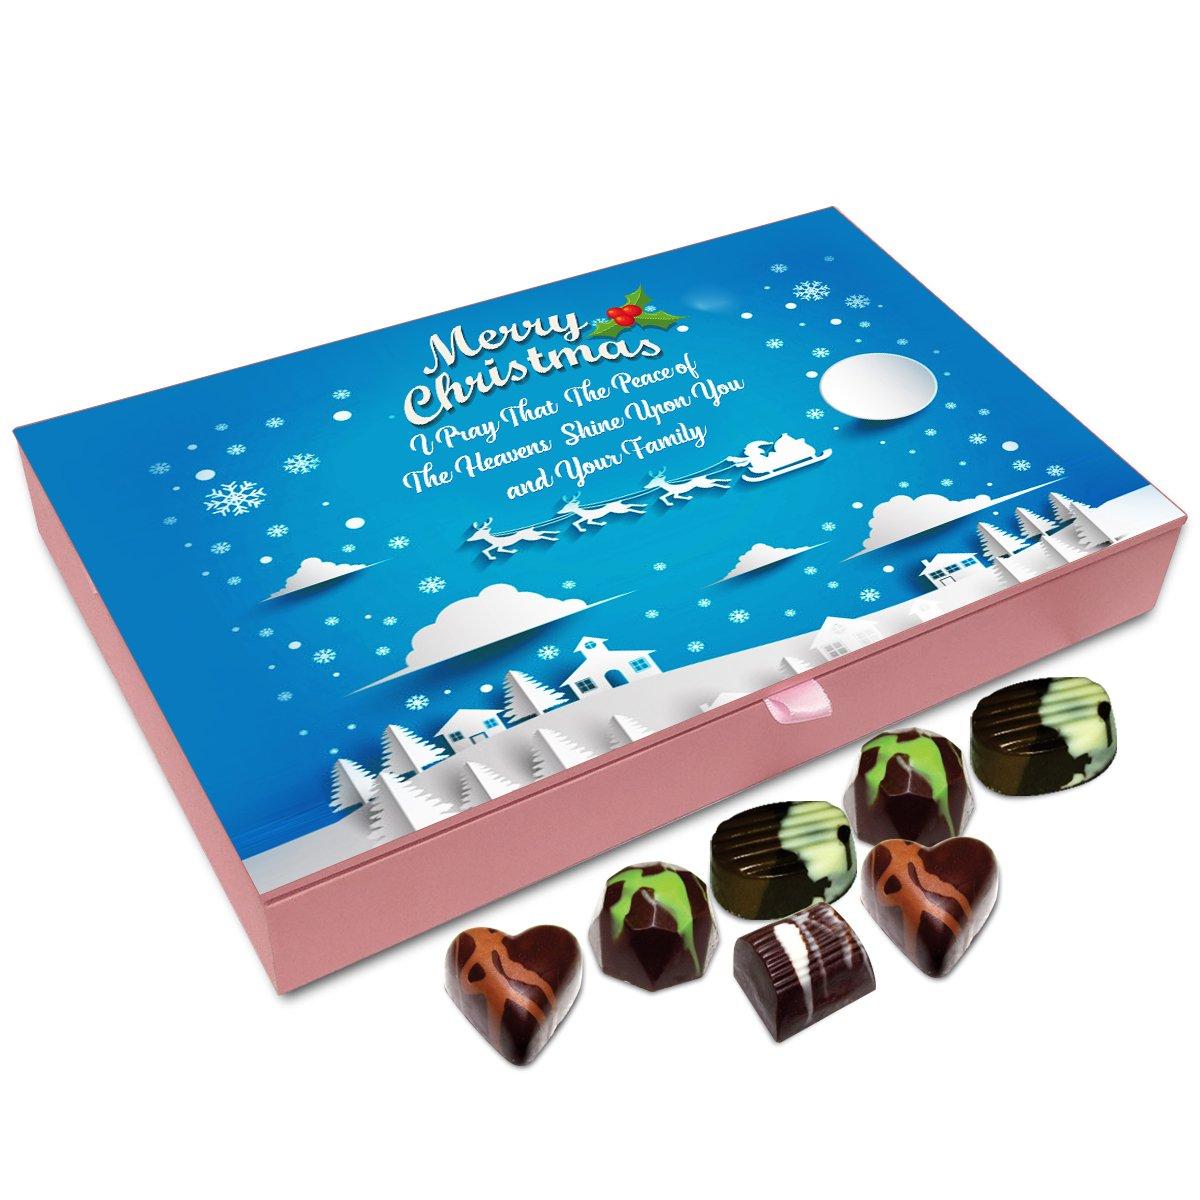 Chocholik Christmas Gift Box – I Pray That Peace of Heaven Shine Upon You On Christmas Chocolate Box – 12pc